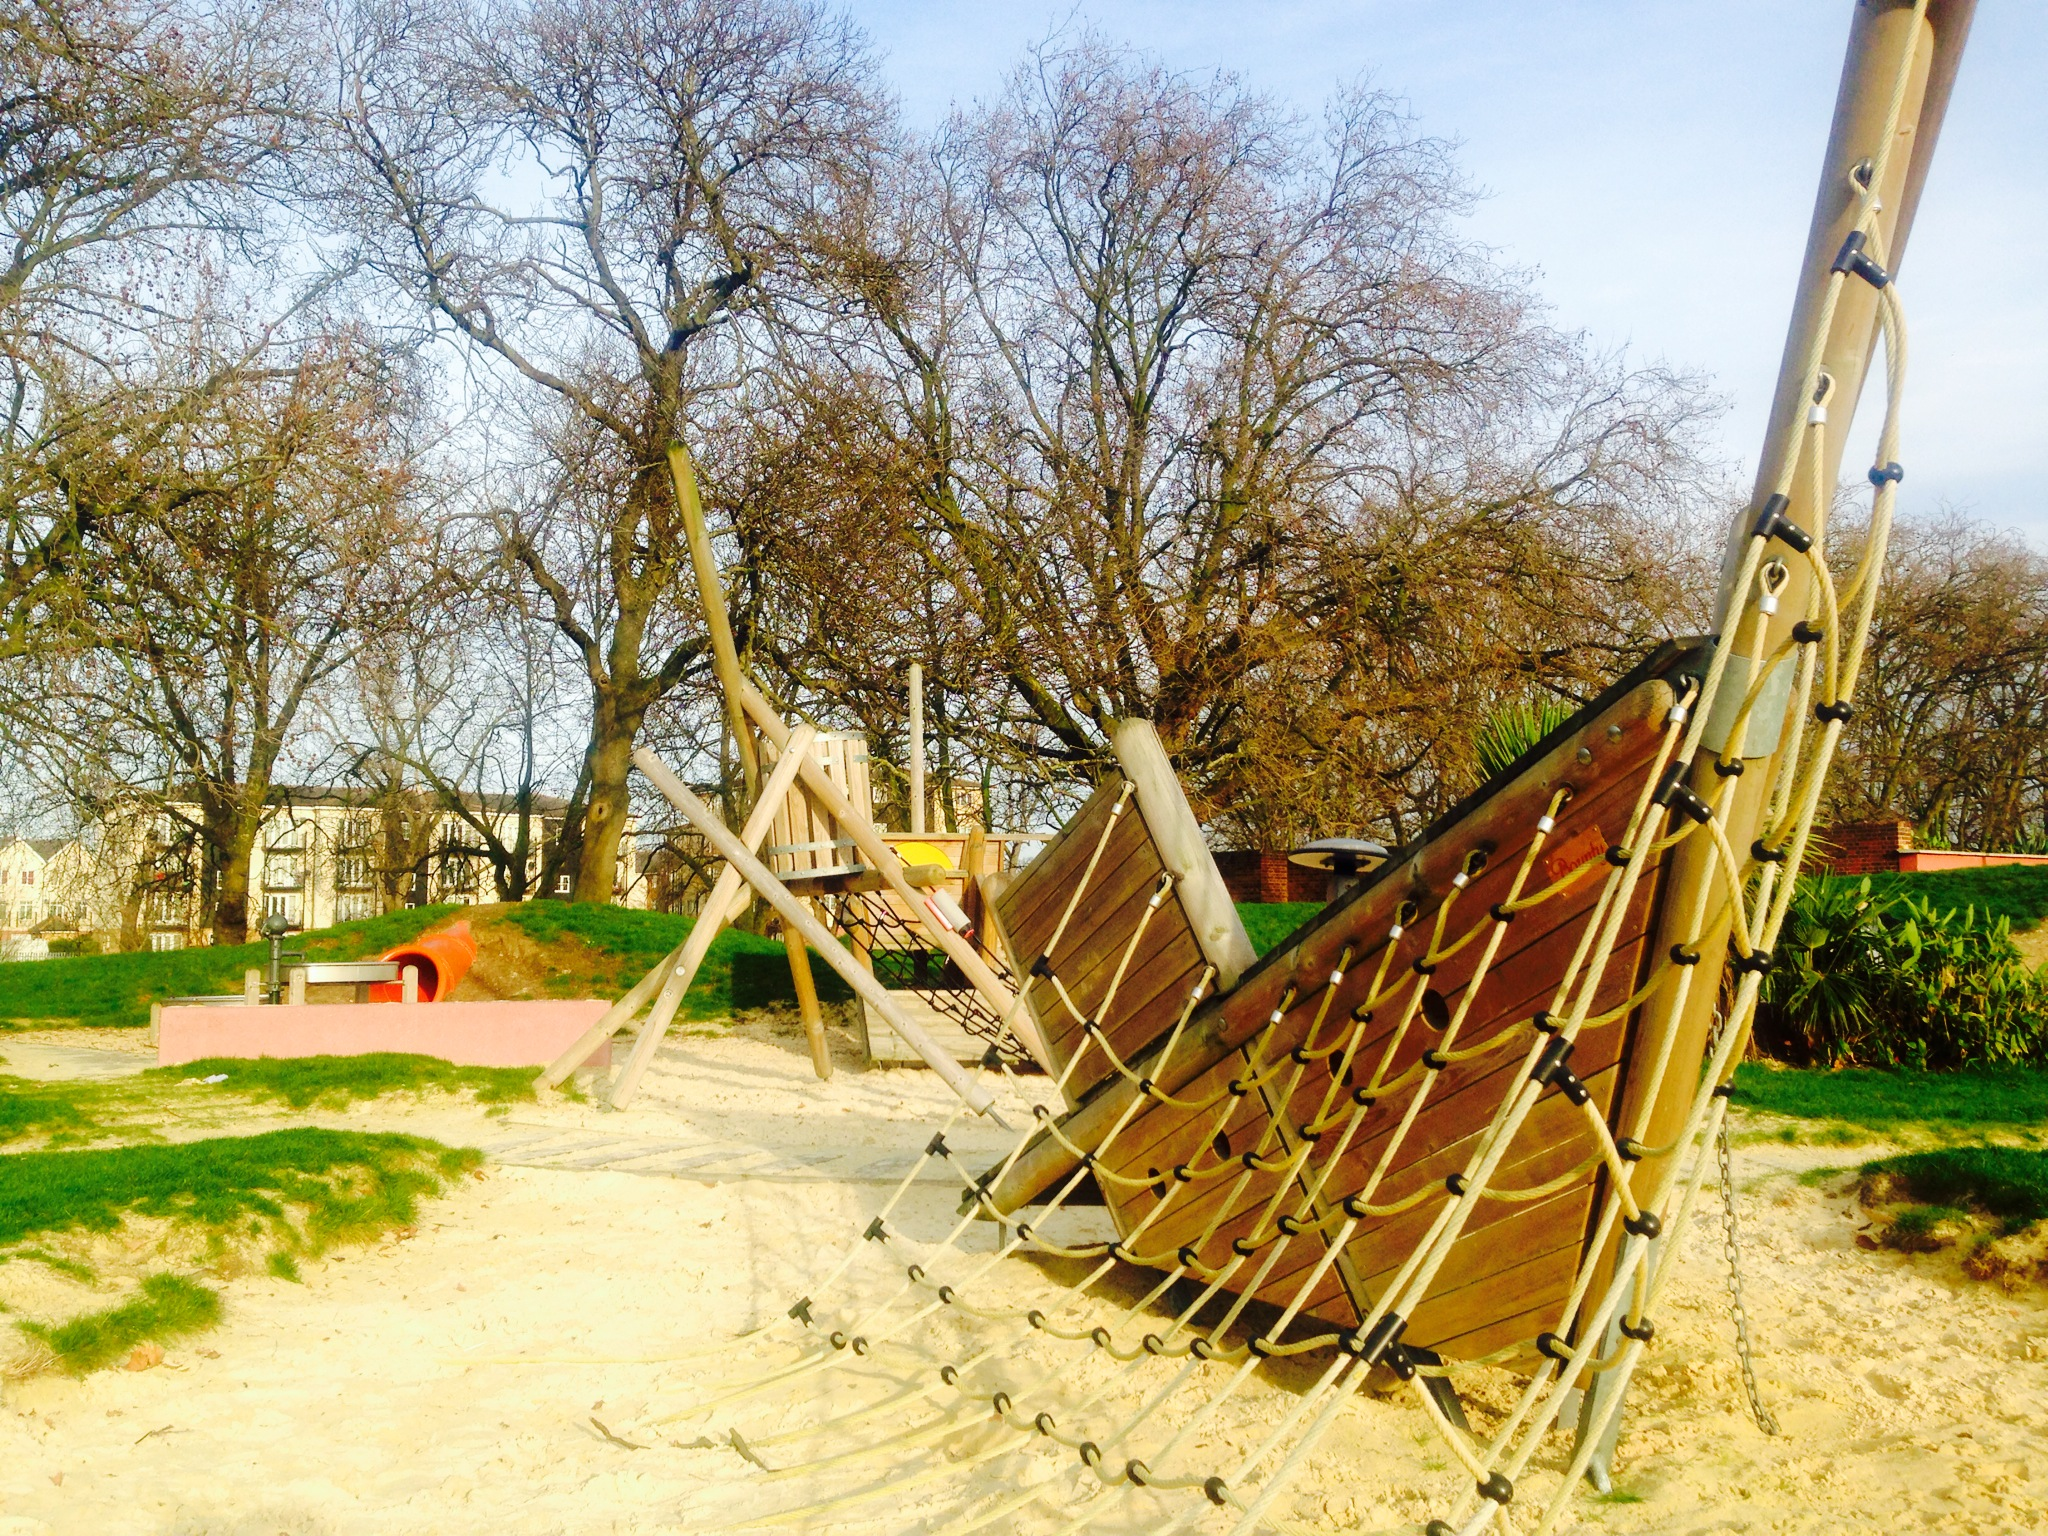 20151218 photo9 - play area